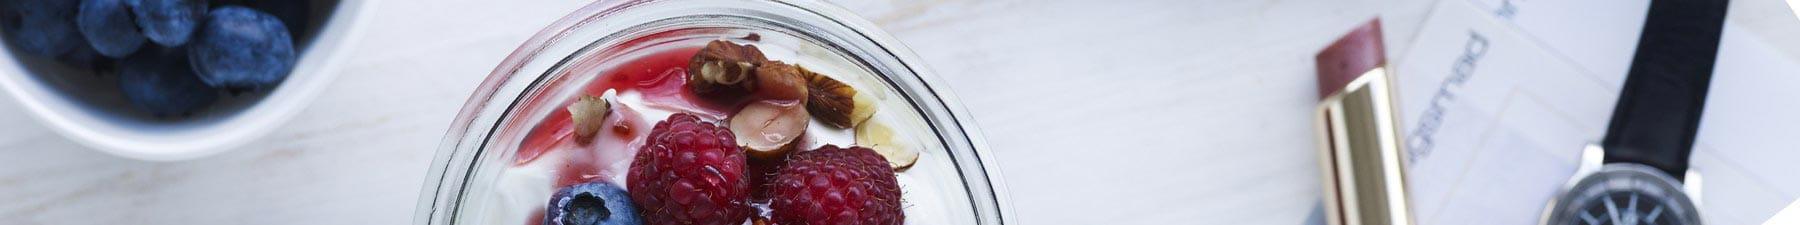 Yogurt with berries next to lipstick and watch